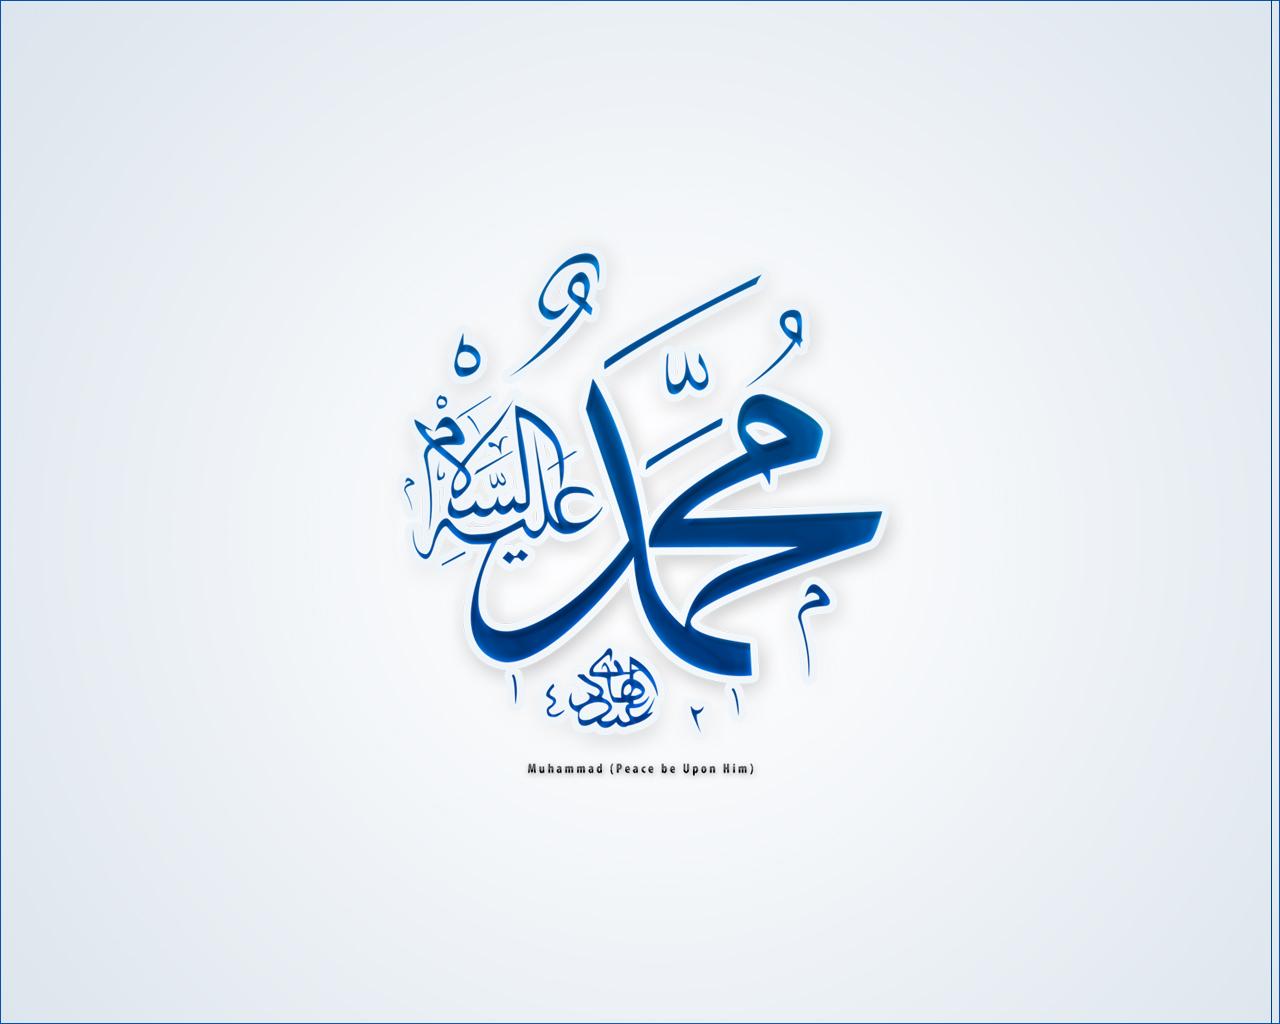 Best Wallpaper Name Nasir - 22-Muhammad_PBUM-Wallpaper  Pictures_94489.jpg